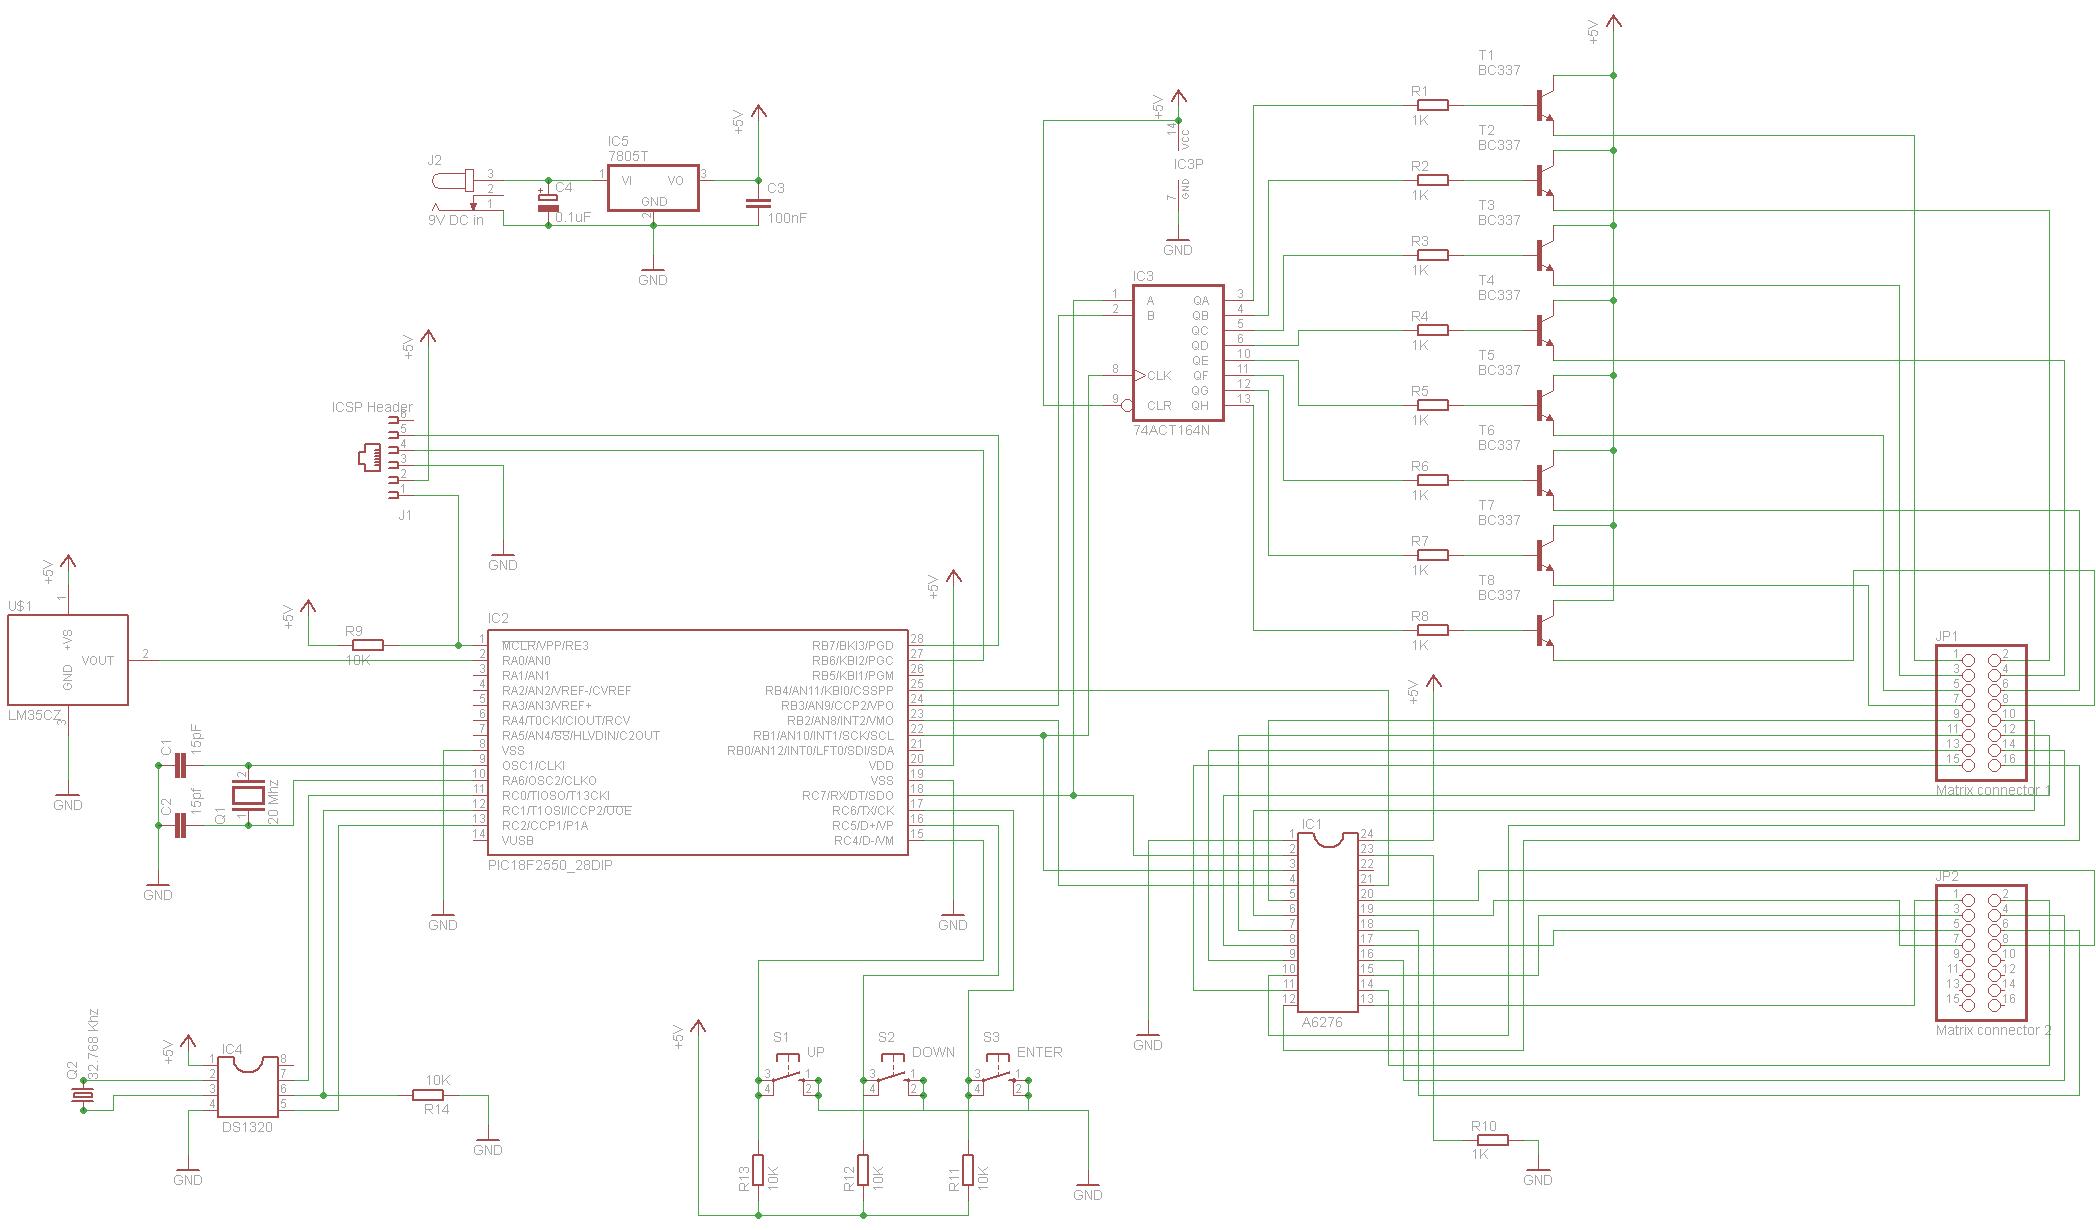 16x8 LED Matrix Display Schematic